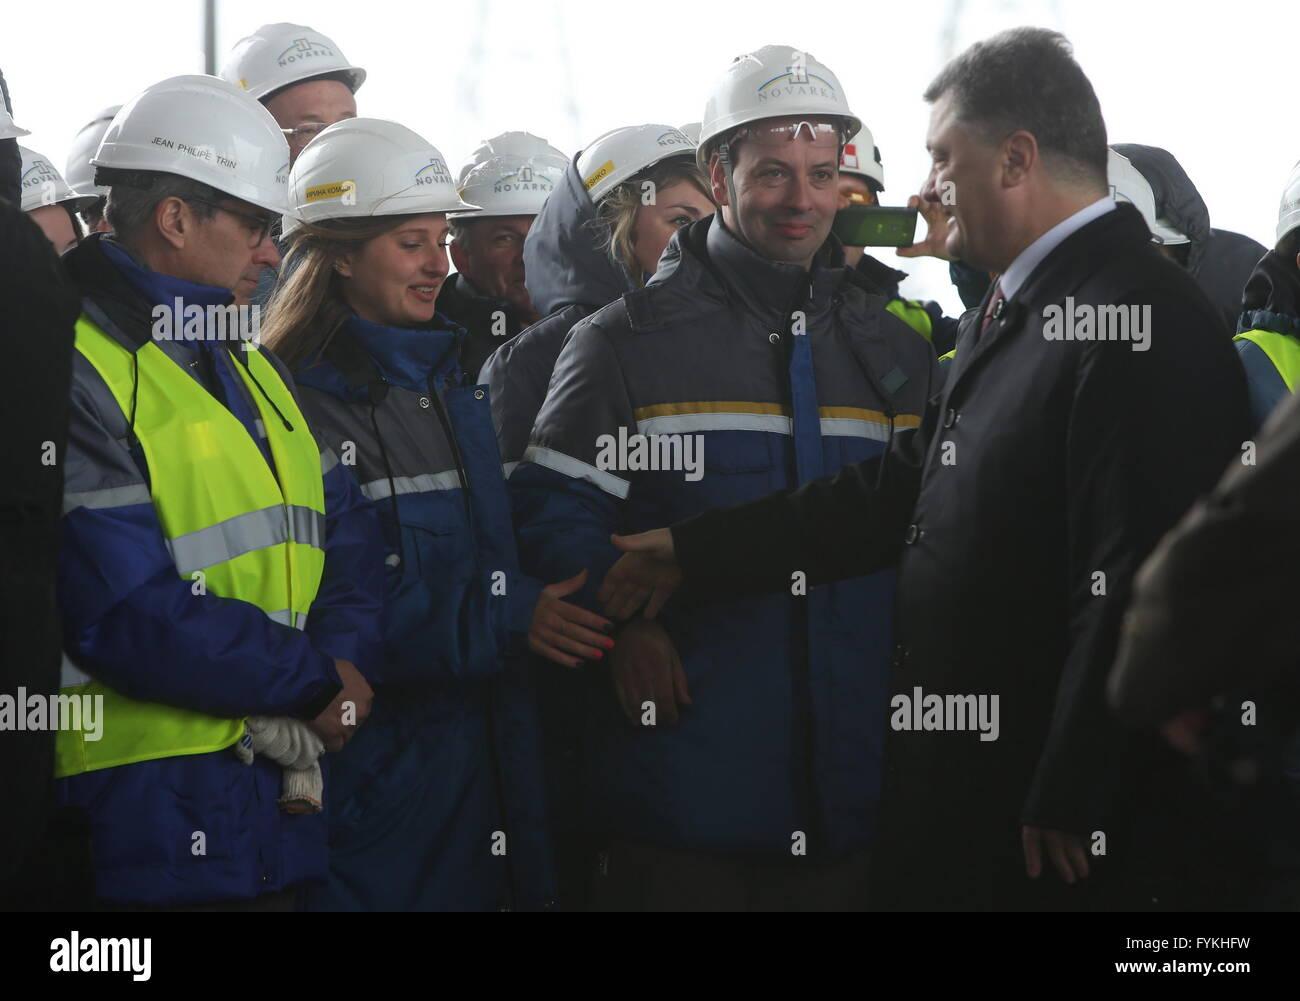 Chernobyl, Ukraine. 26th Apr, 2016. Ukrainian President Petro Poroshenko shakes hands with workers on the construction - Stock Image